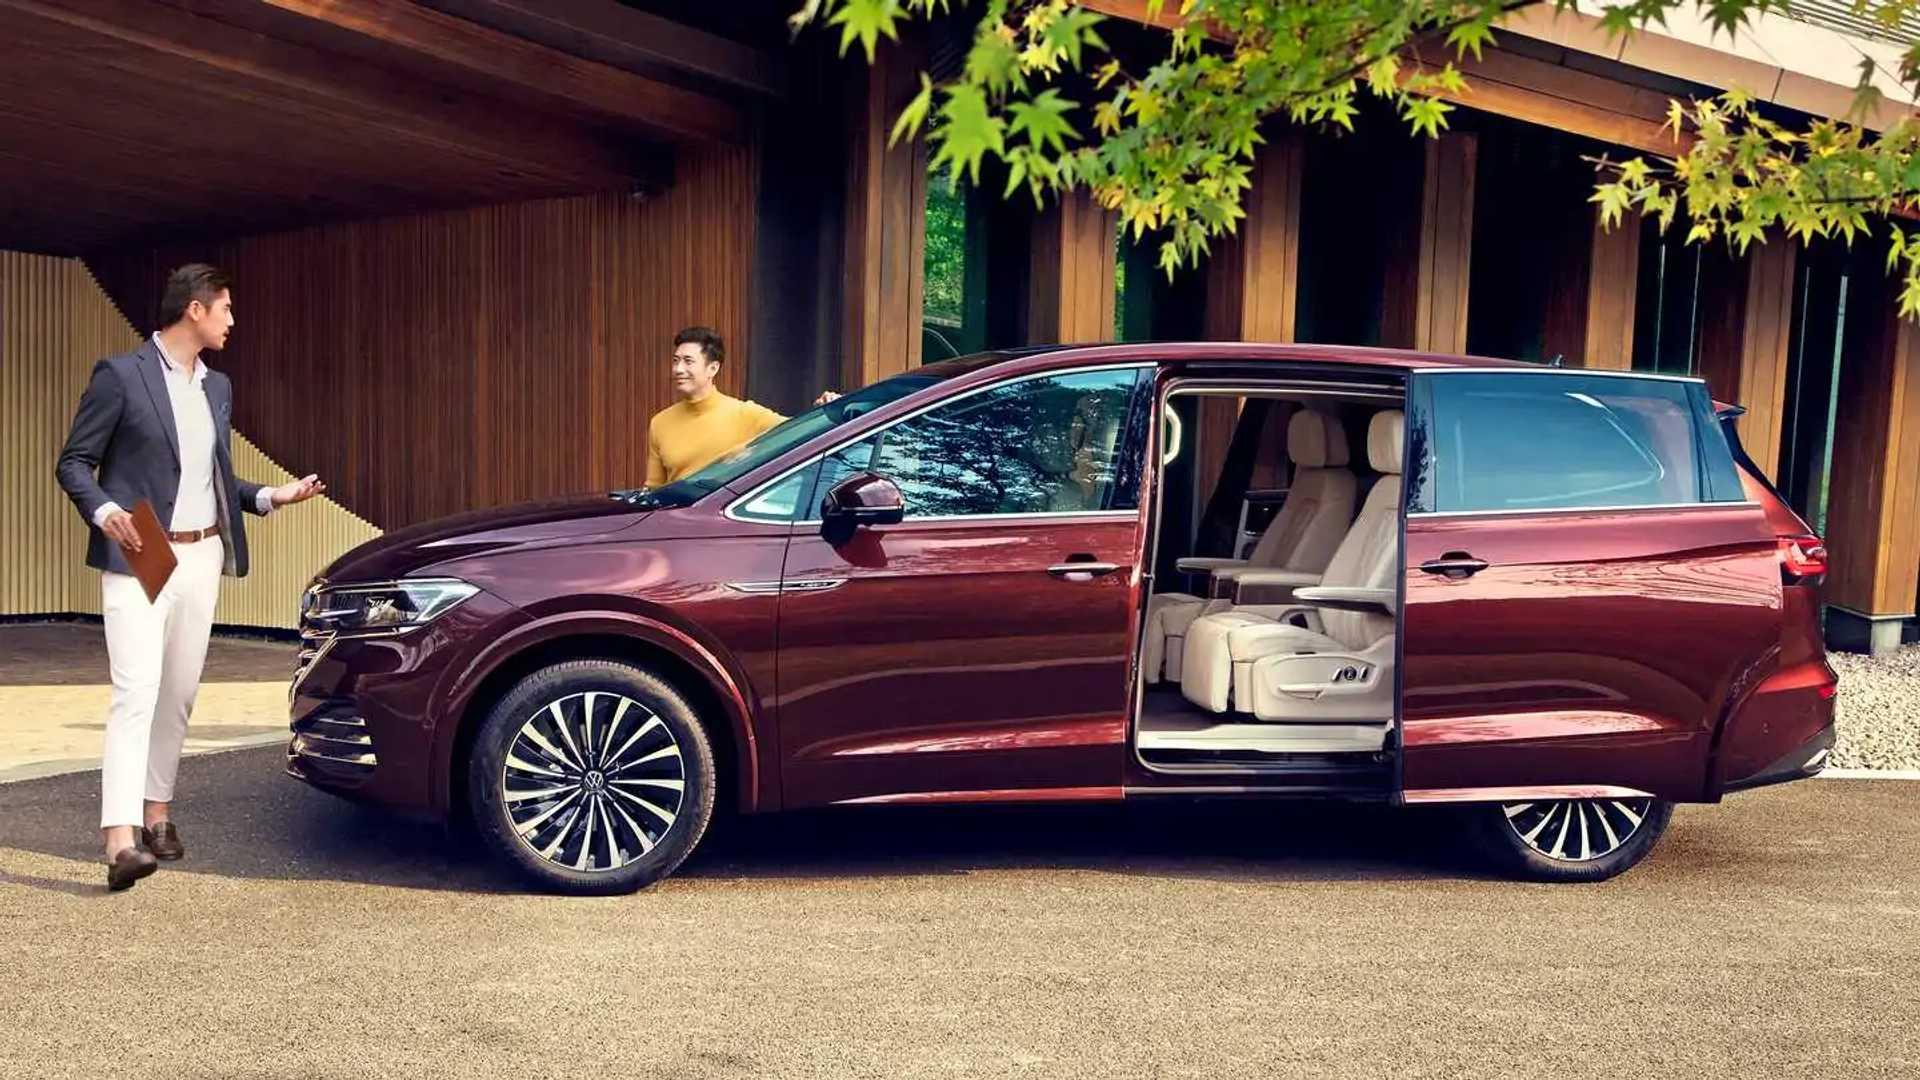 Burlappcar: More pictures of the new VW Viloran Minivan